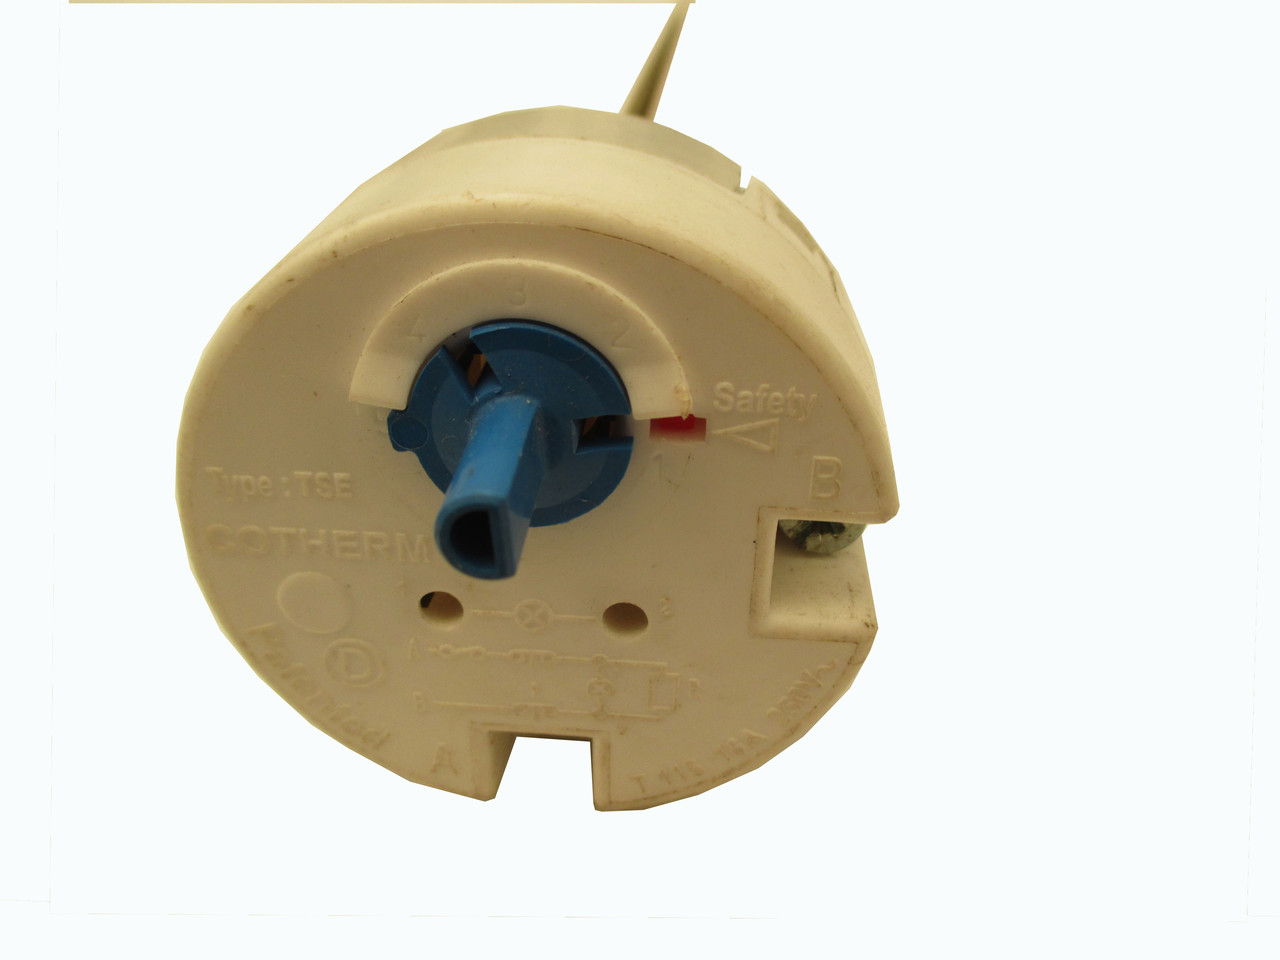 схема подключения терморегулятора рт- 16р1